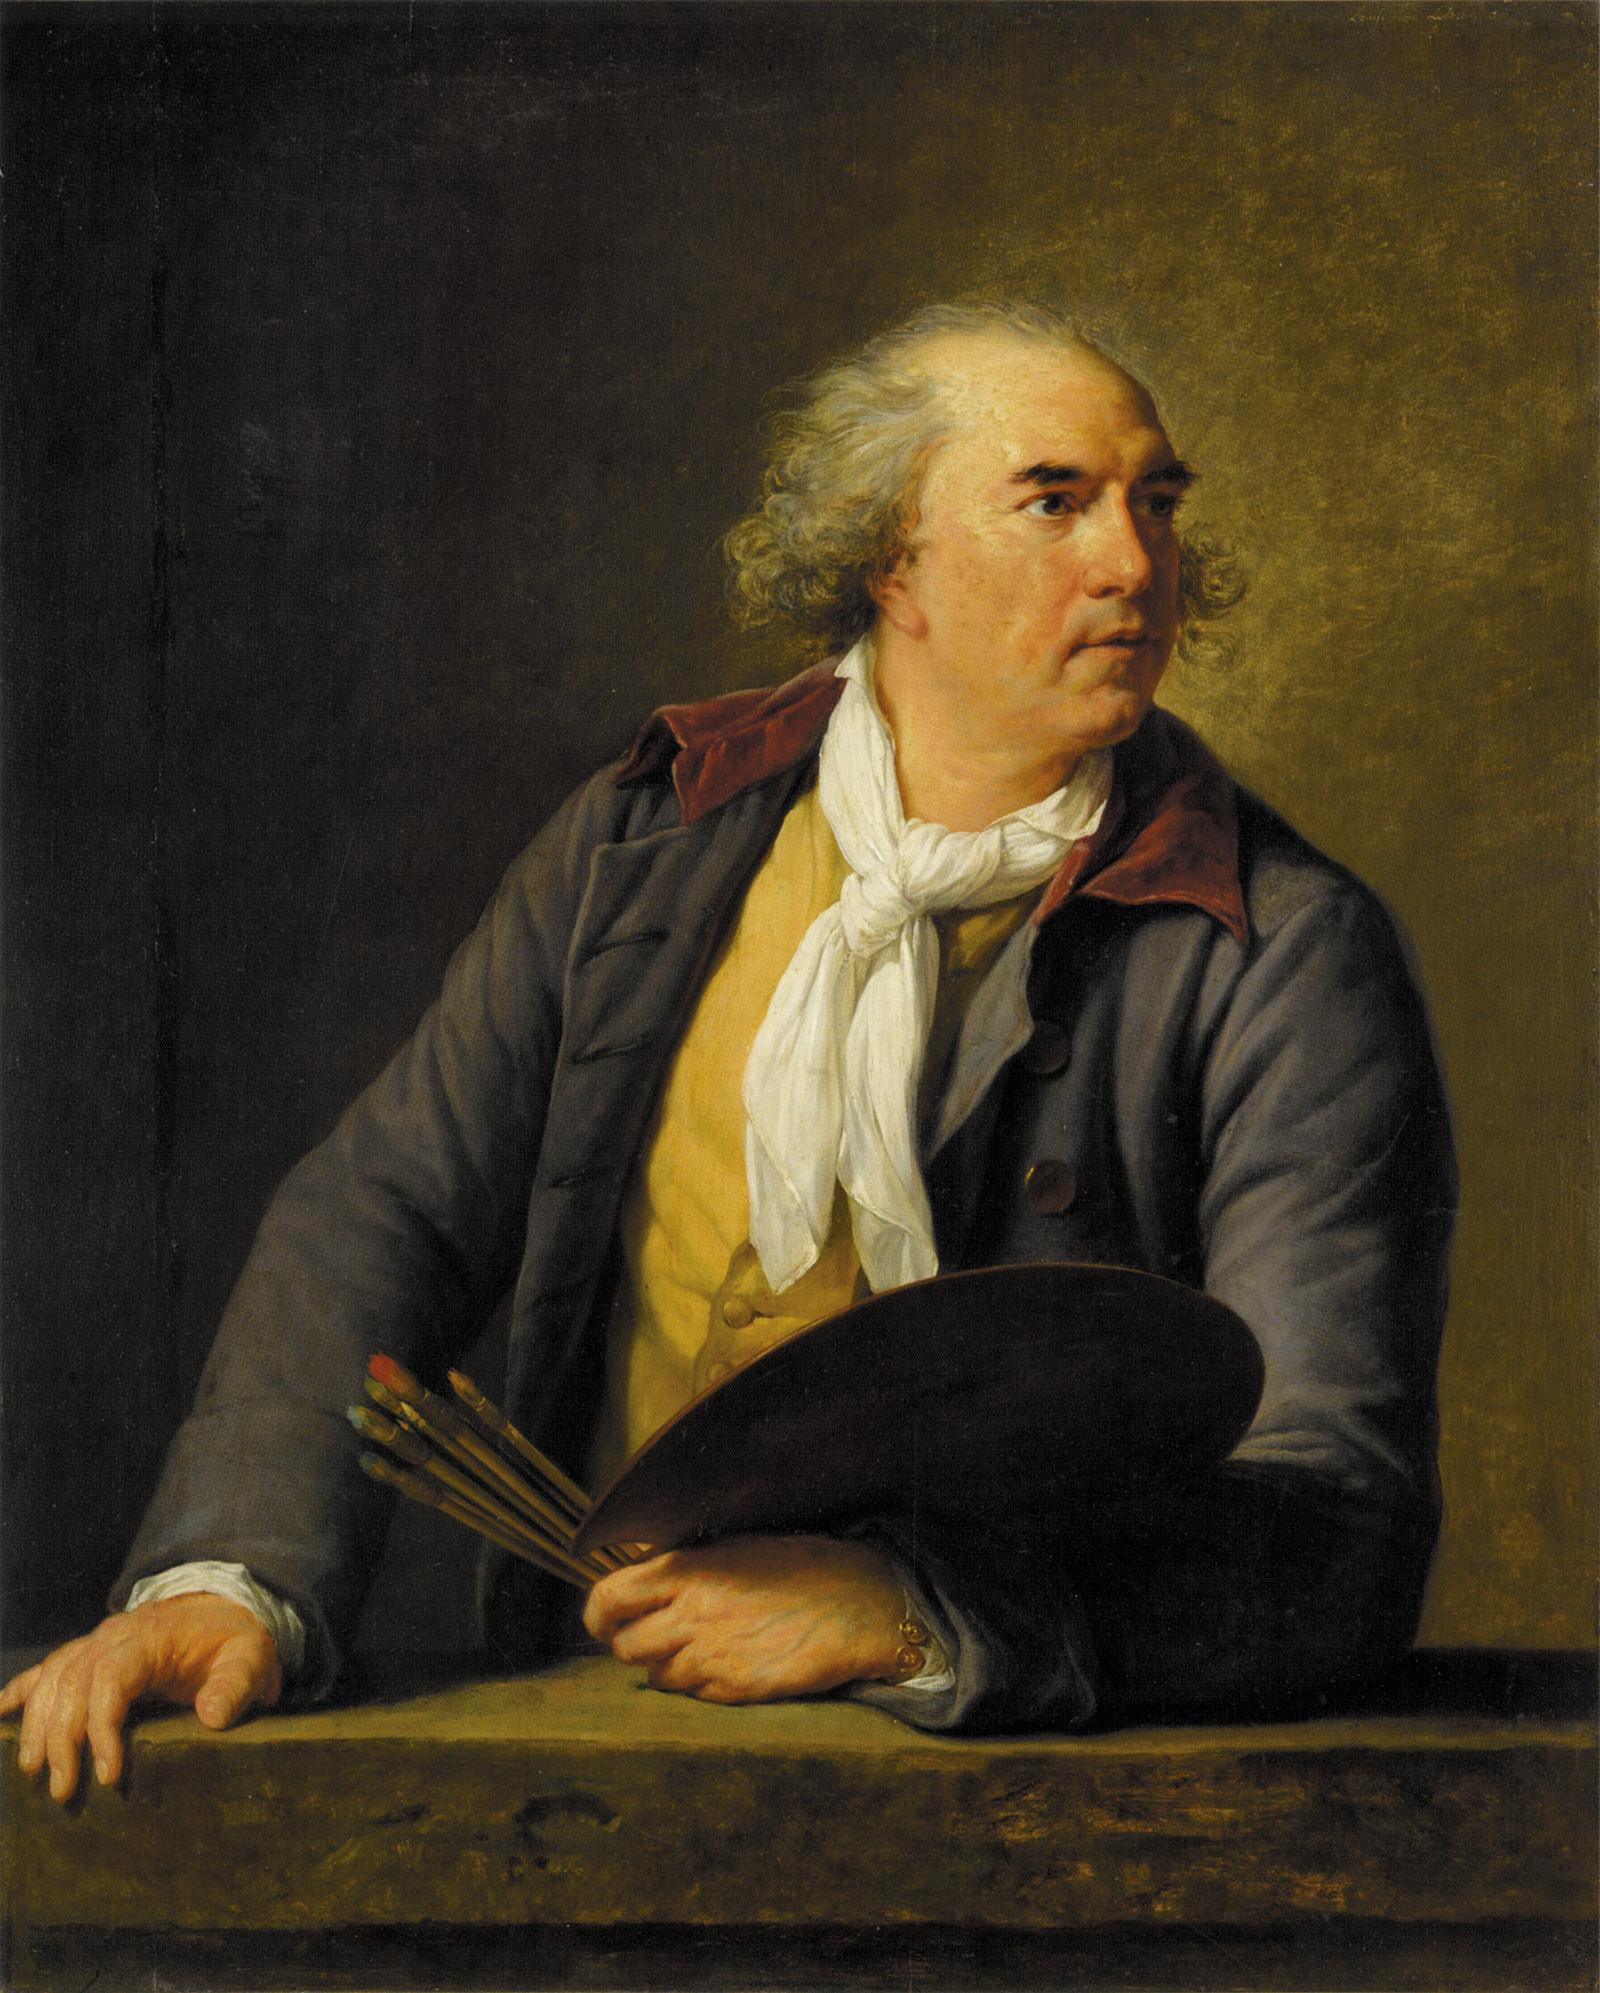 Hubert Robert; painting by Élisabeth Louise Vigée Le Brun, 1788